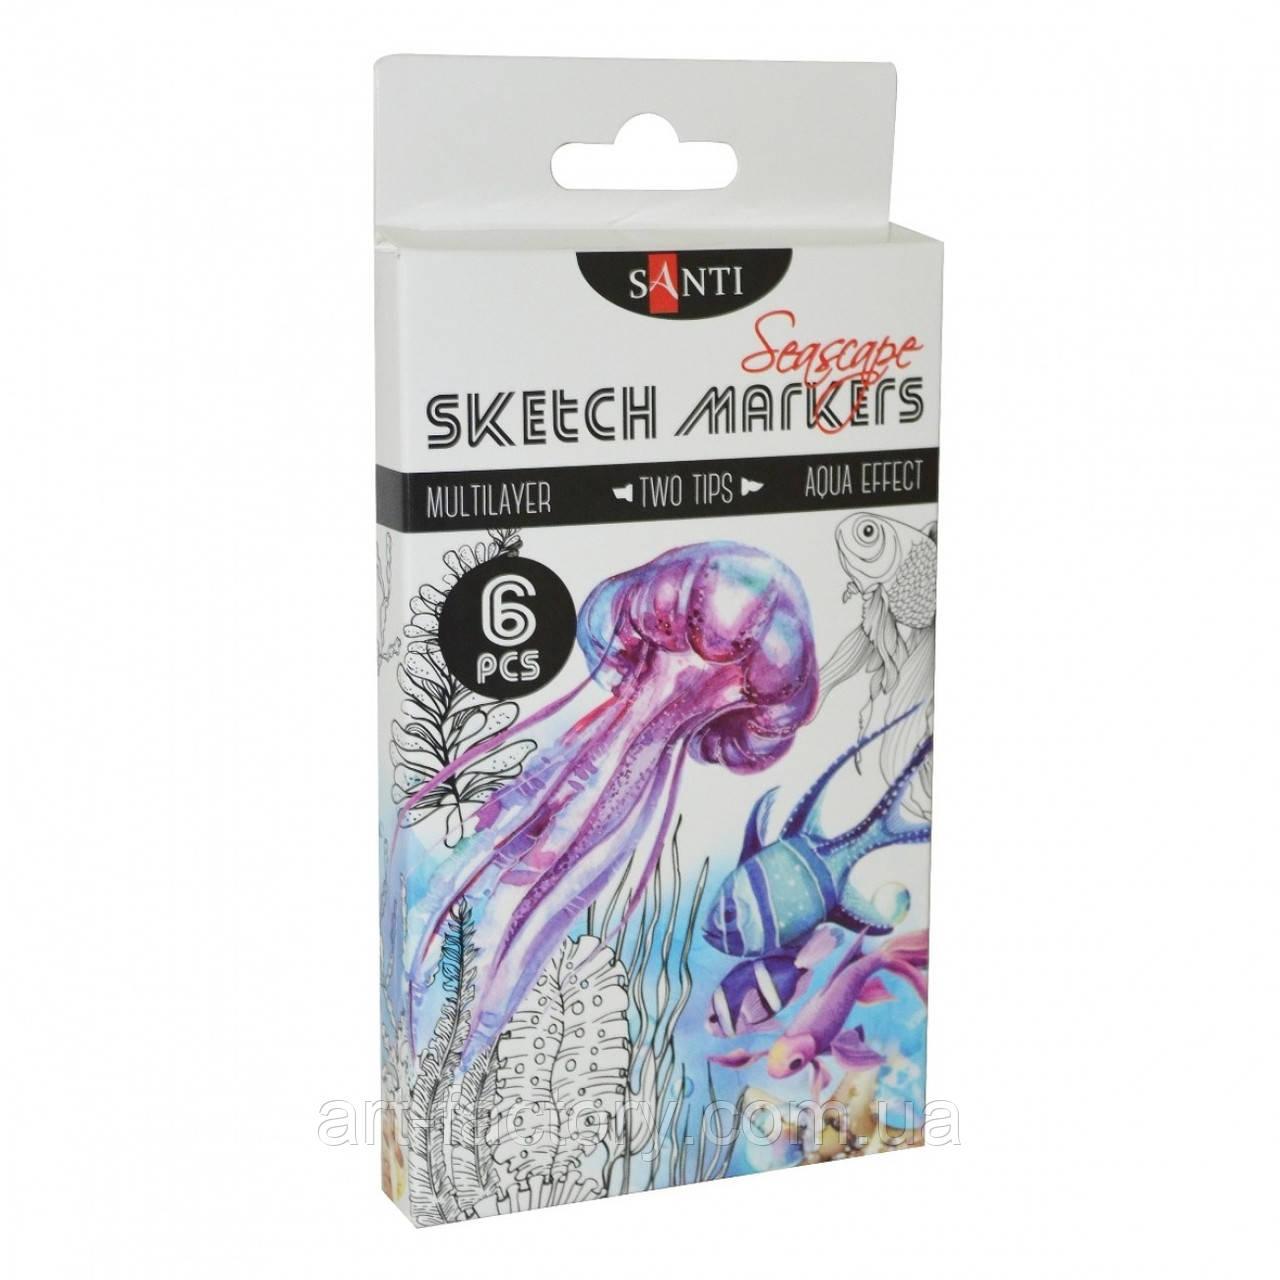 "Набір скетч маркерів SANTI sketch ""Seascape"", 6 шт/уп."